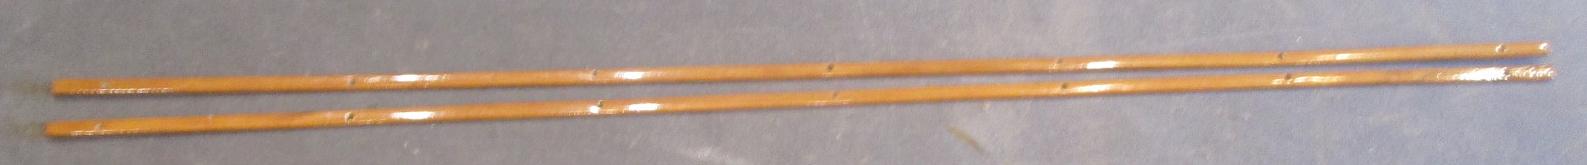 "1986 Rinker V180 Boat Interior Side Wall Trim Insert Set(2) Teak Wood 84"" x 7/8"""